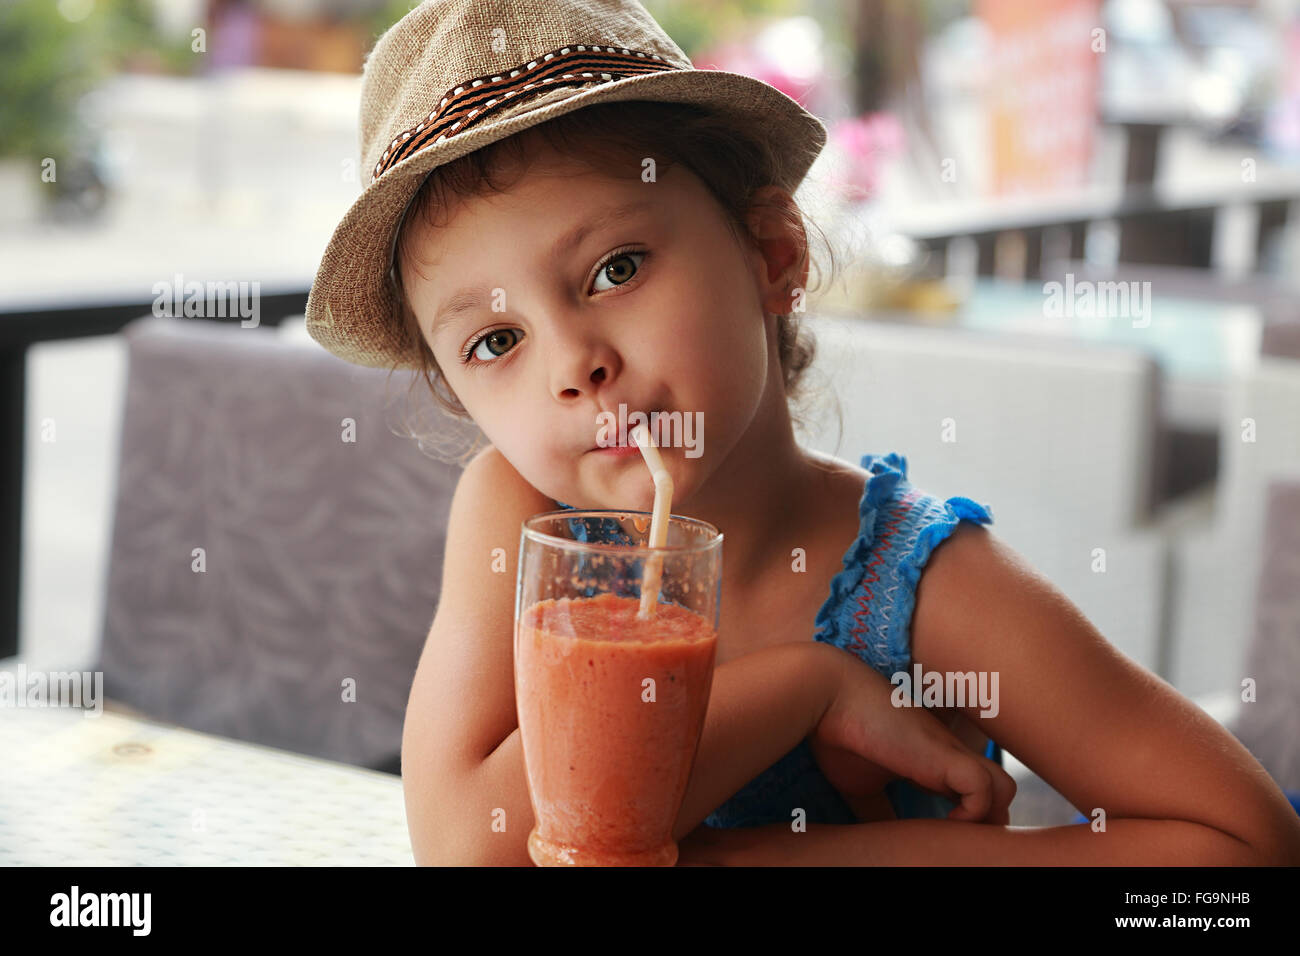 Fun kid cute girl drinking smoothie sain jus dans street restaurant. Closeup portrait Photo Stock